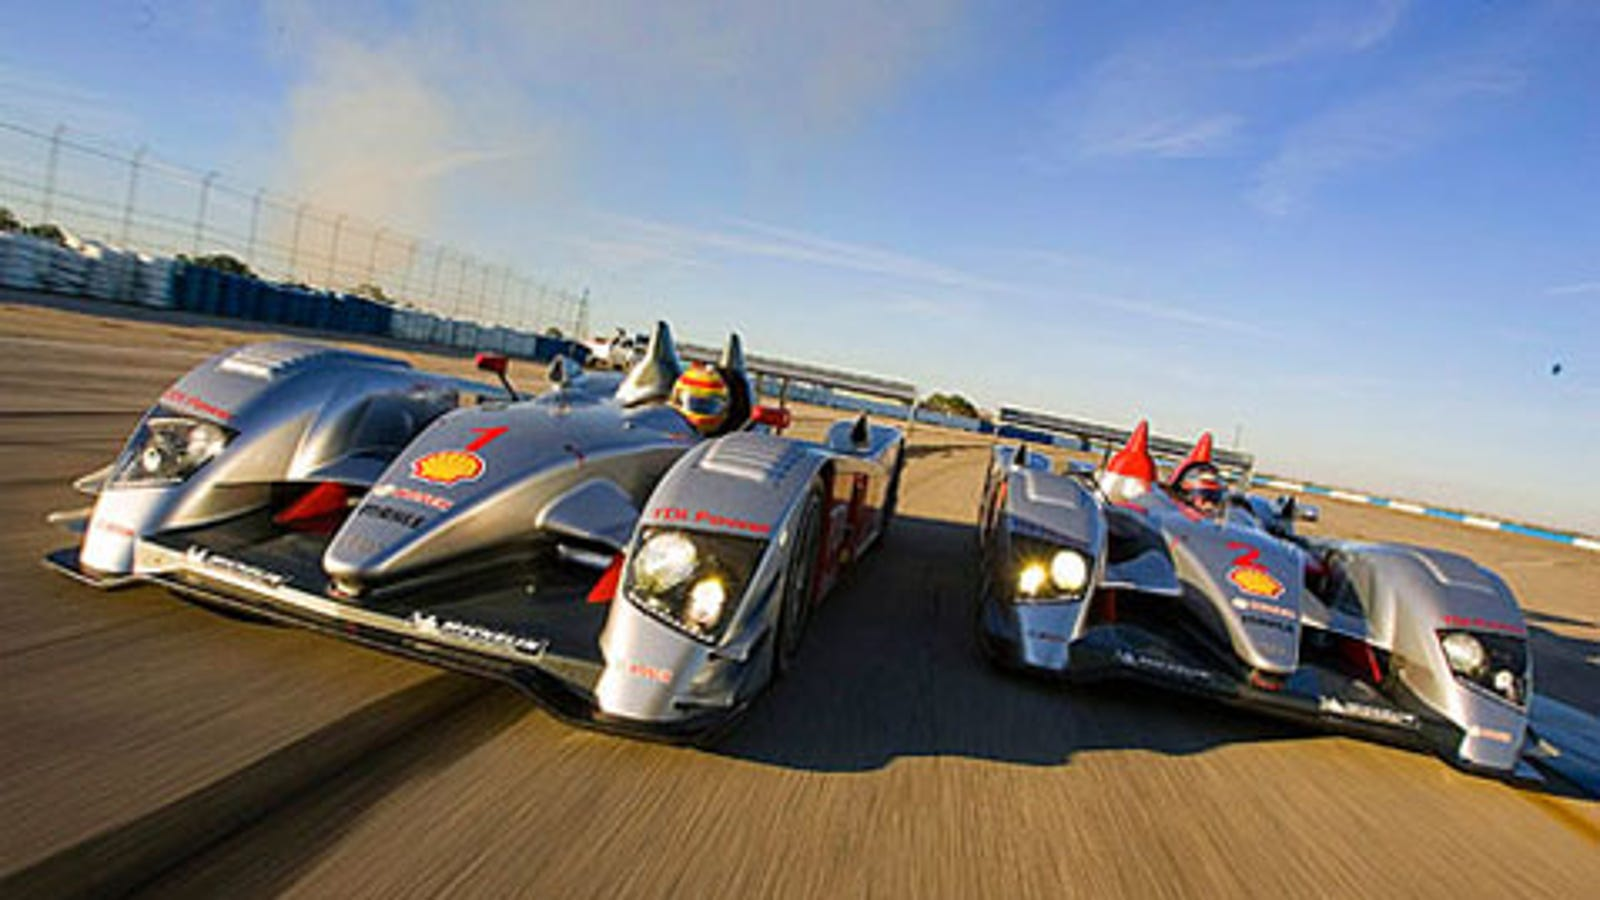 Should Race Cars Look Like Real Cars?